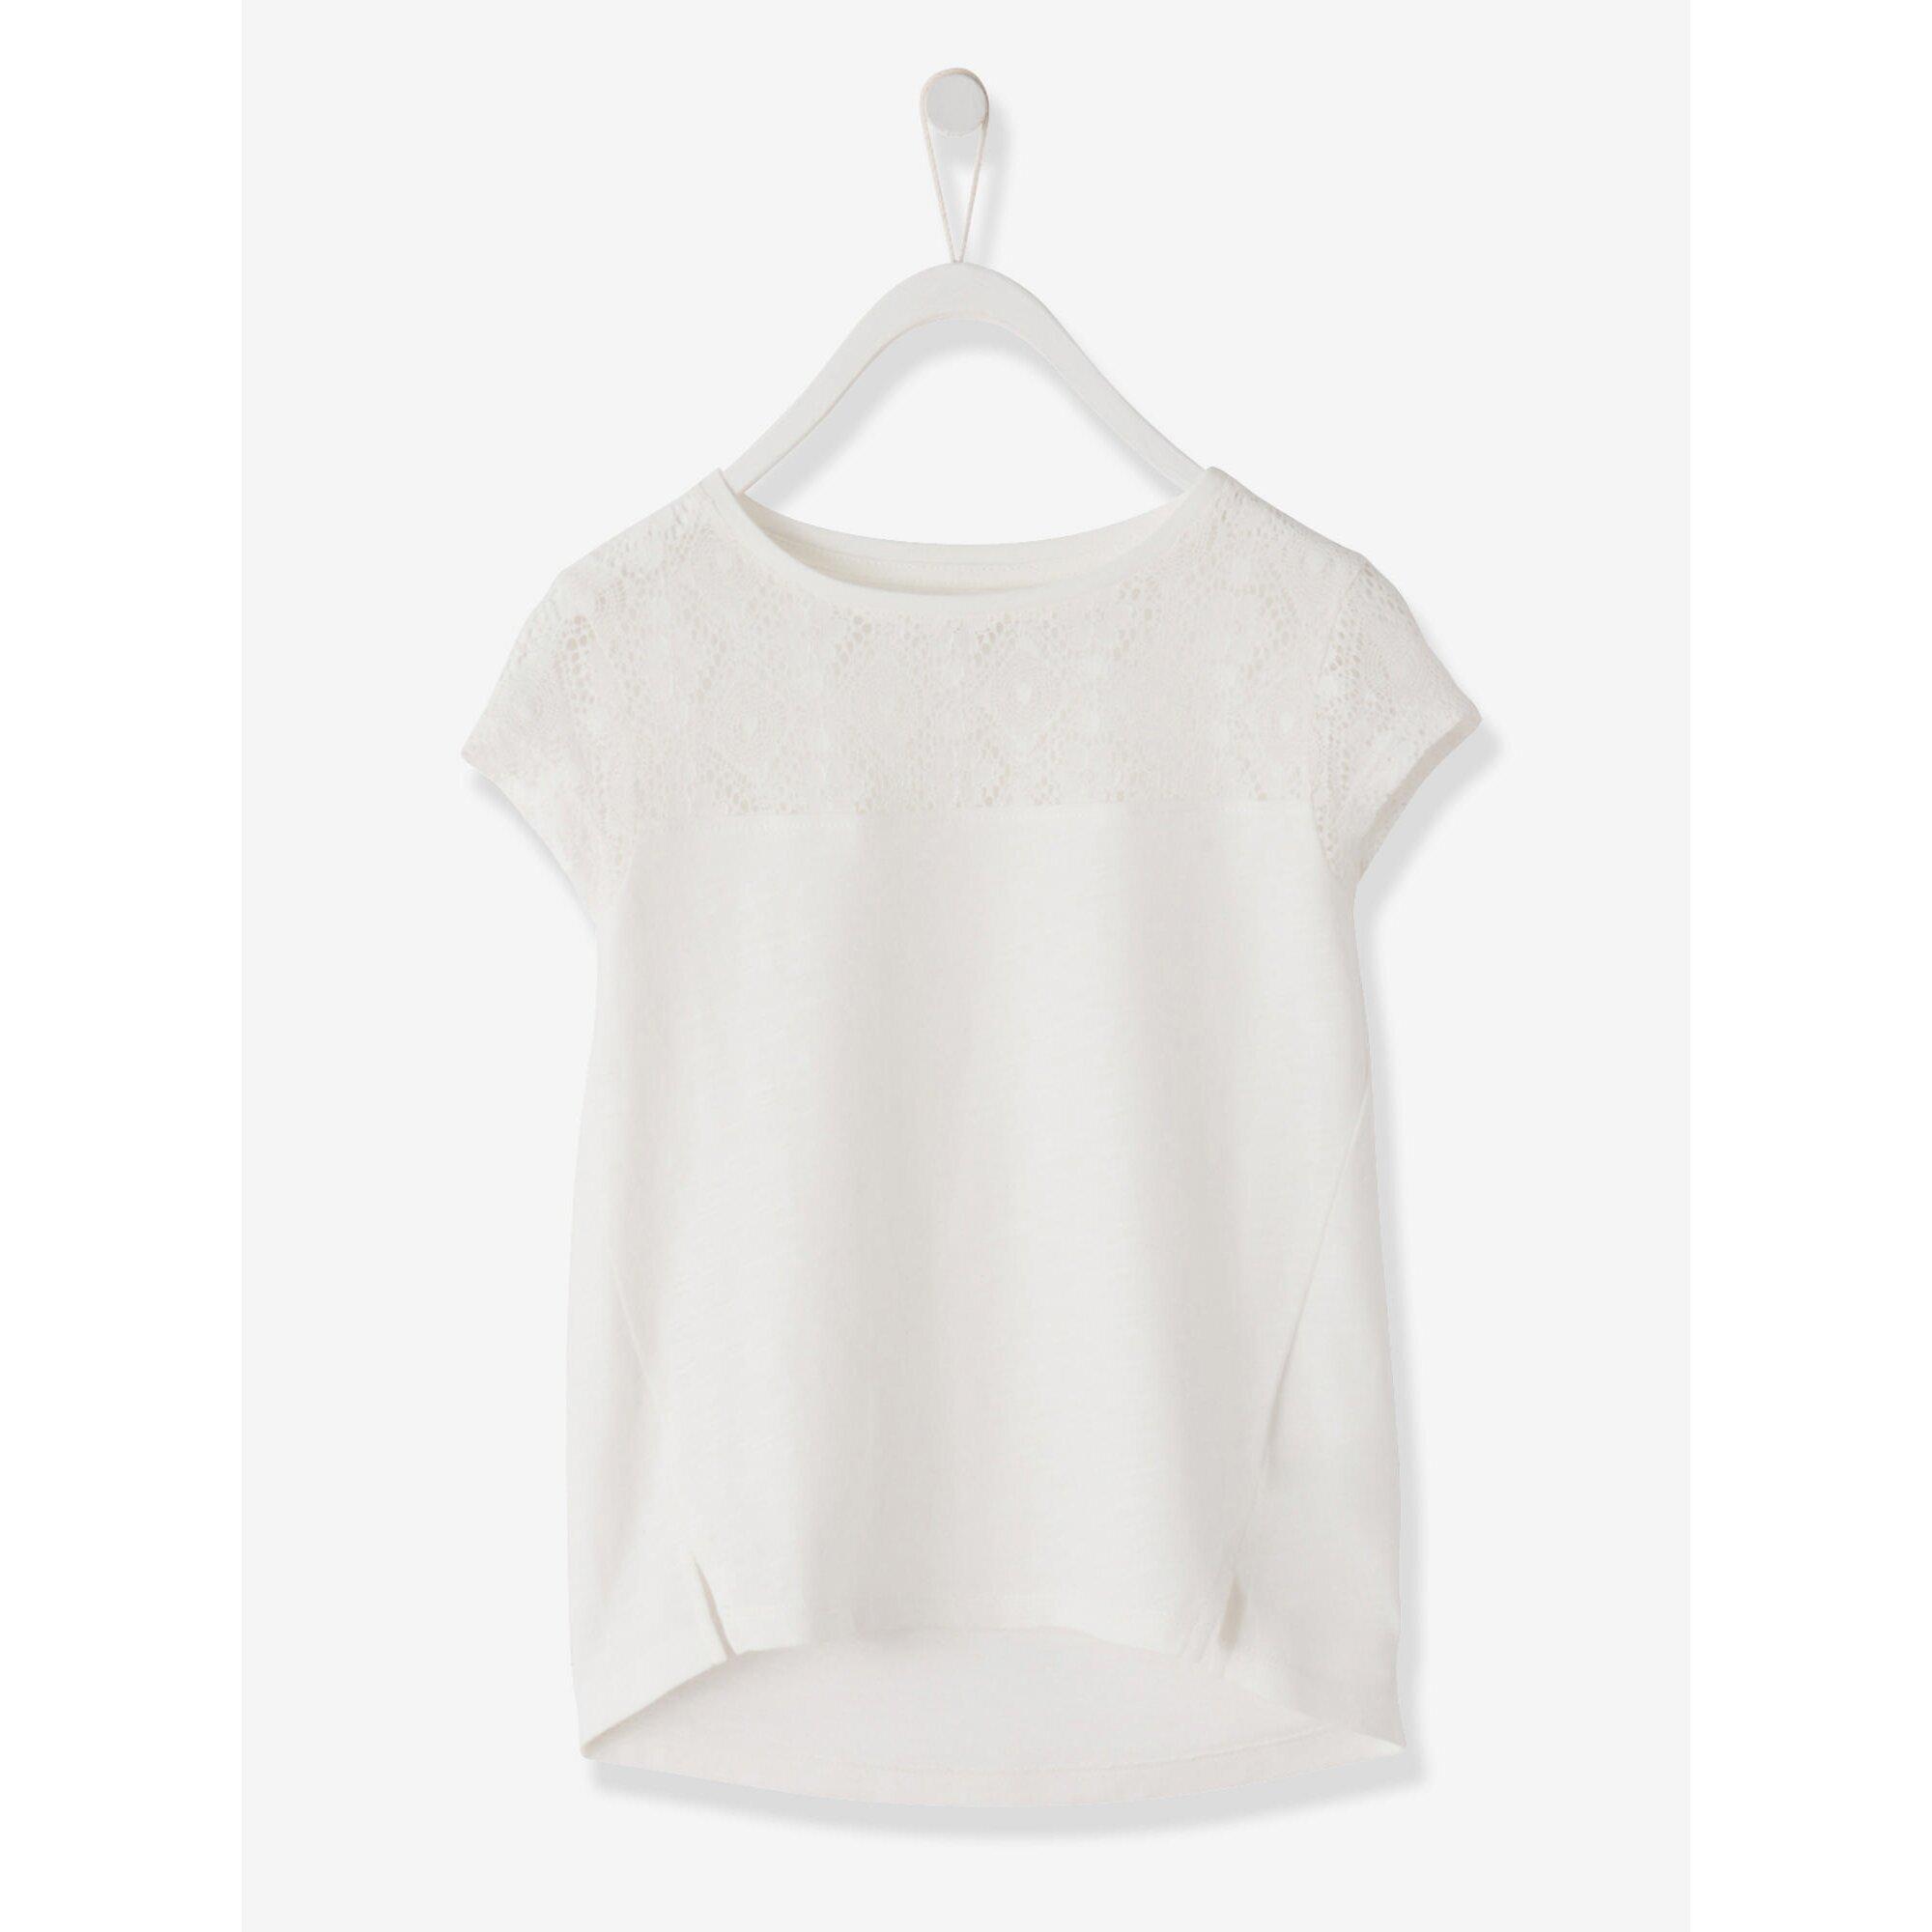 vertbaudet-madchen-kurzarm-shirt-mit-spitze, 9.99 EUR @ babywalz-de